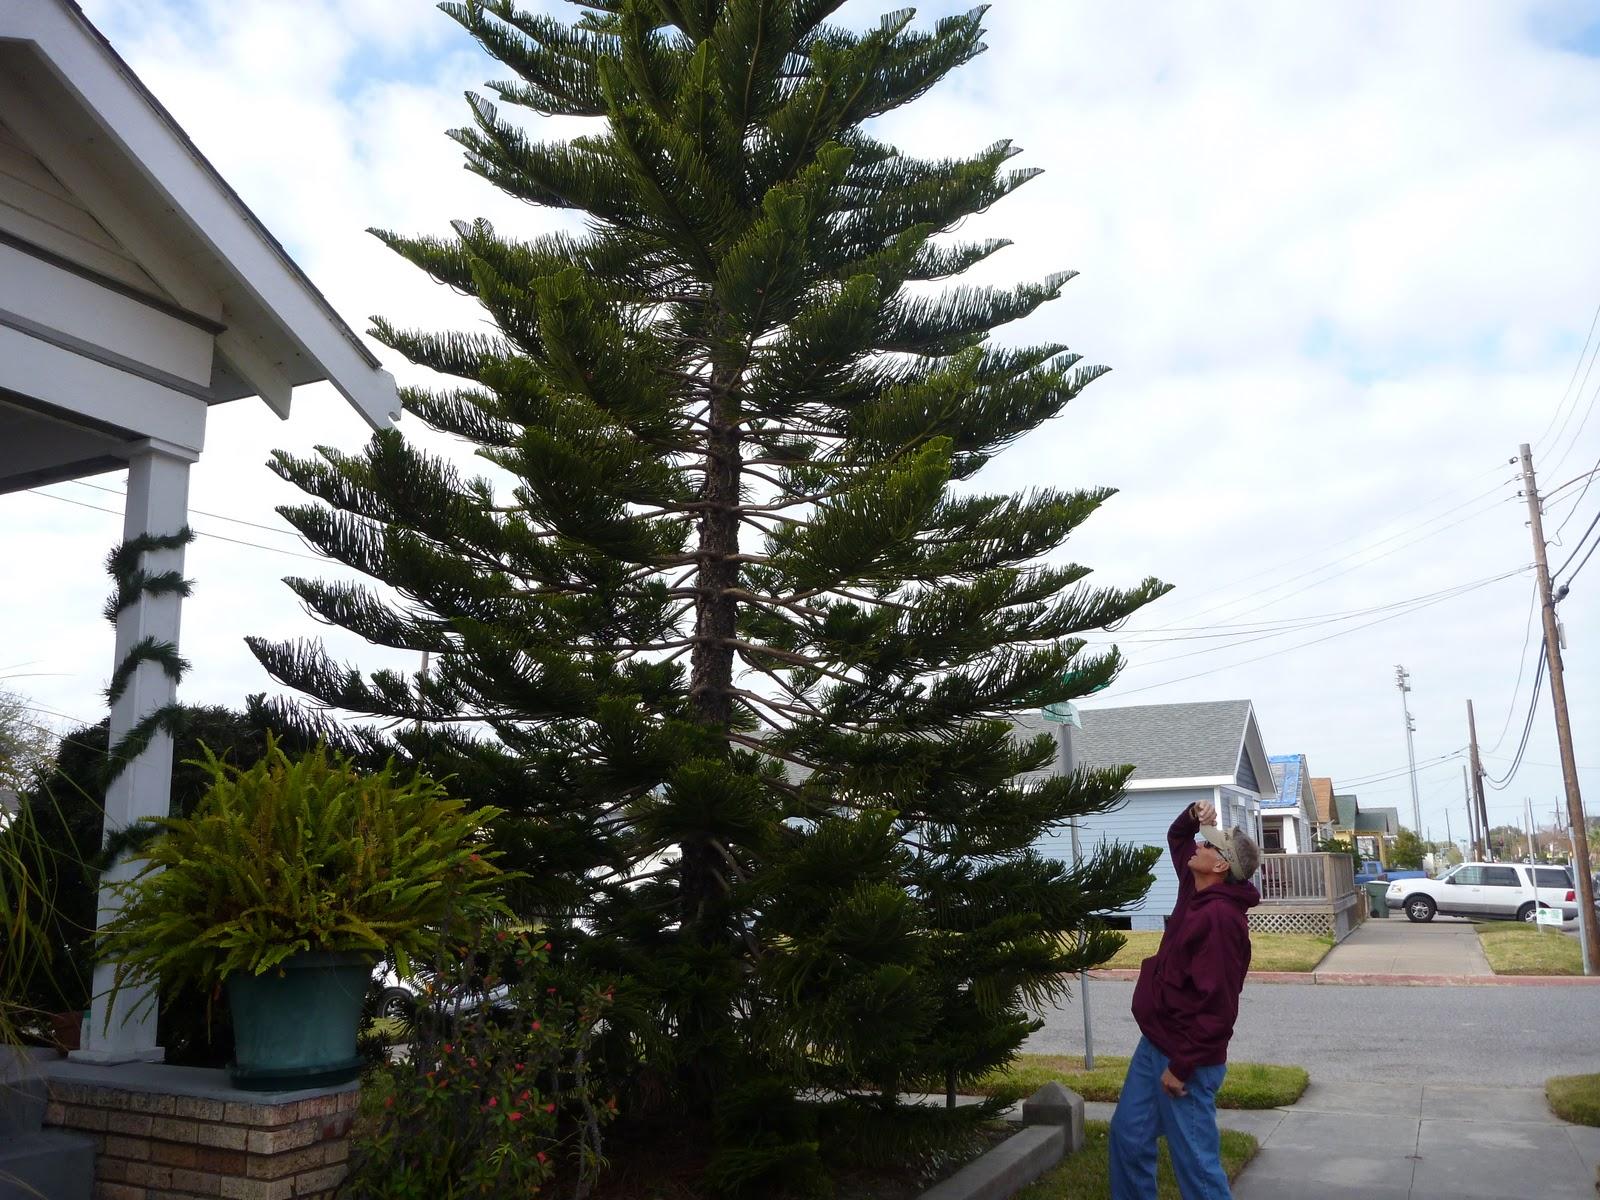 Galveston Gardening: Norfolk Island Pine - Know the Risks Before You ...